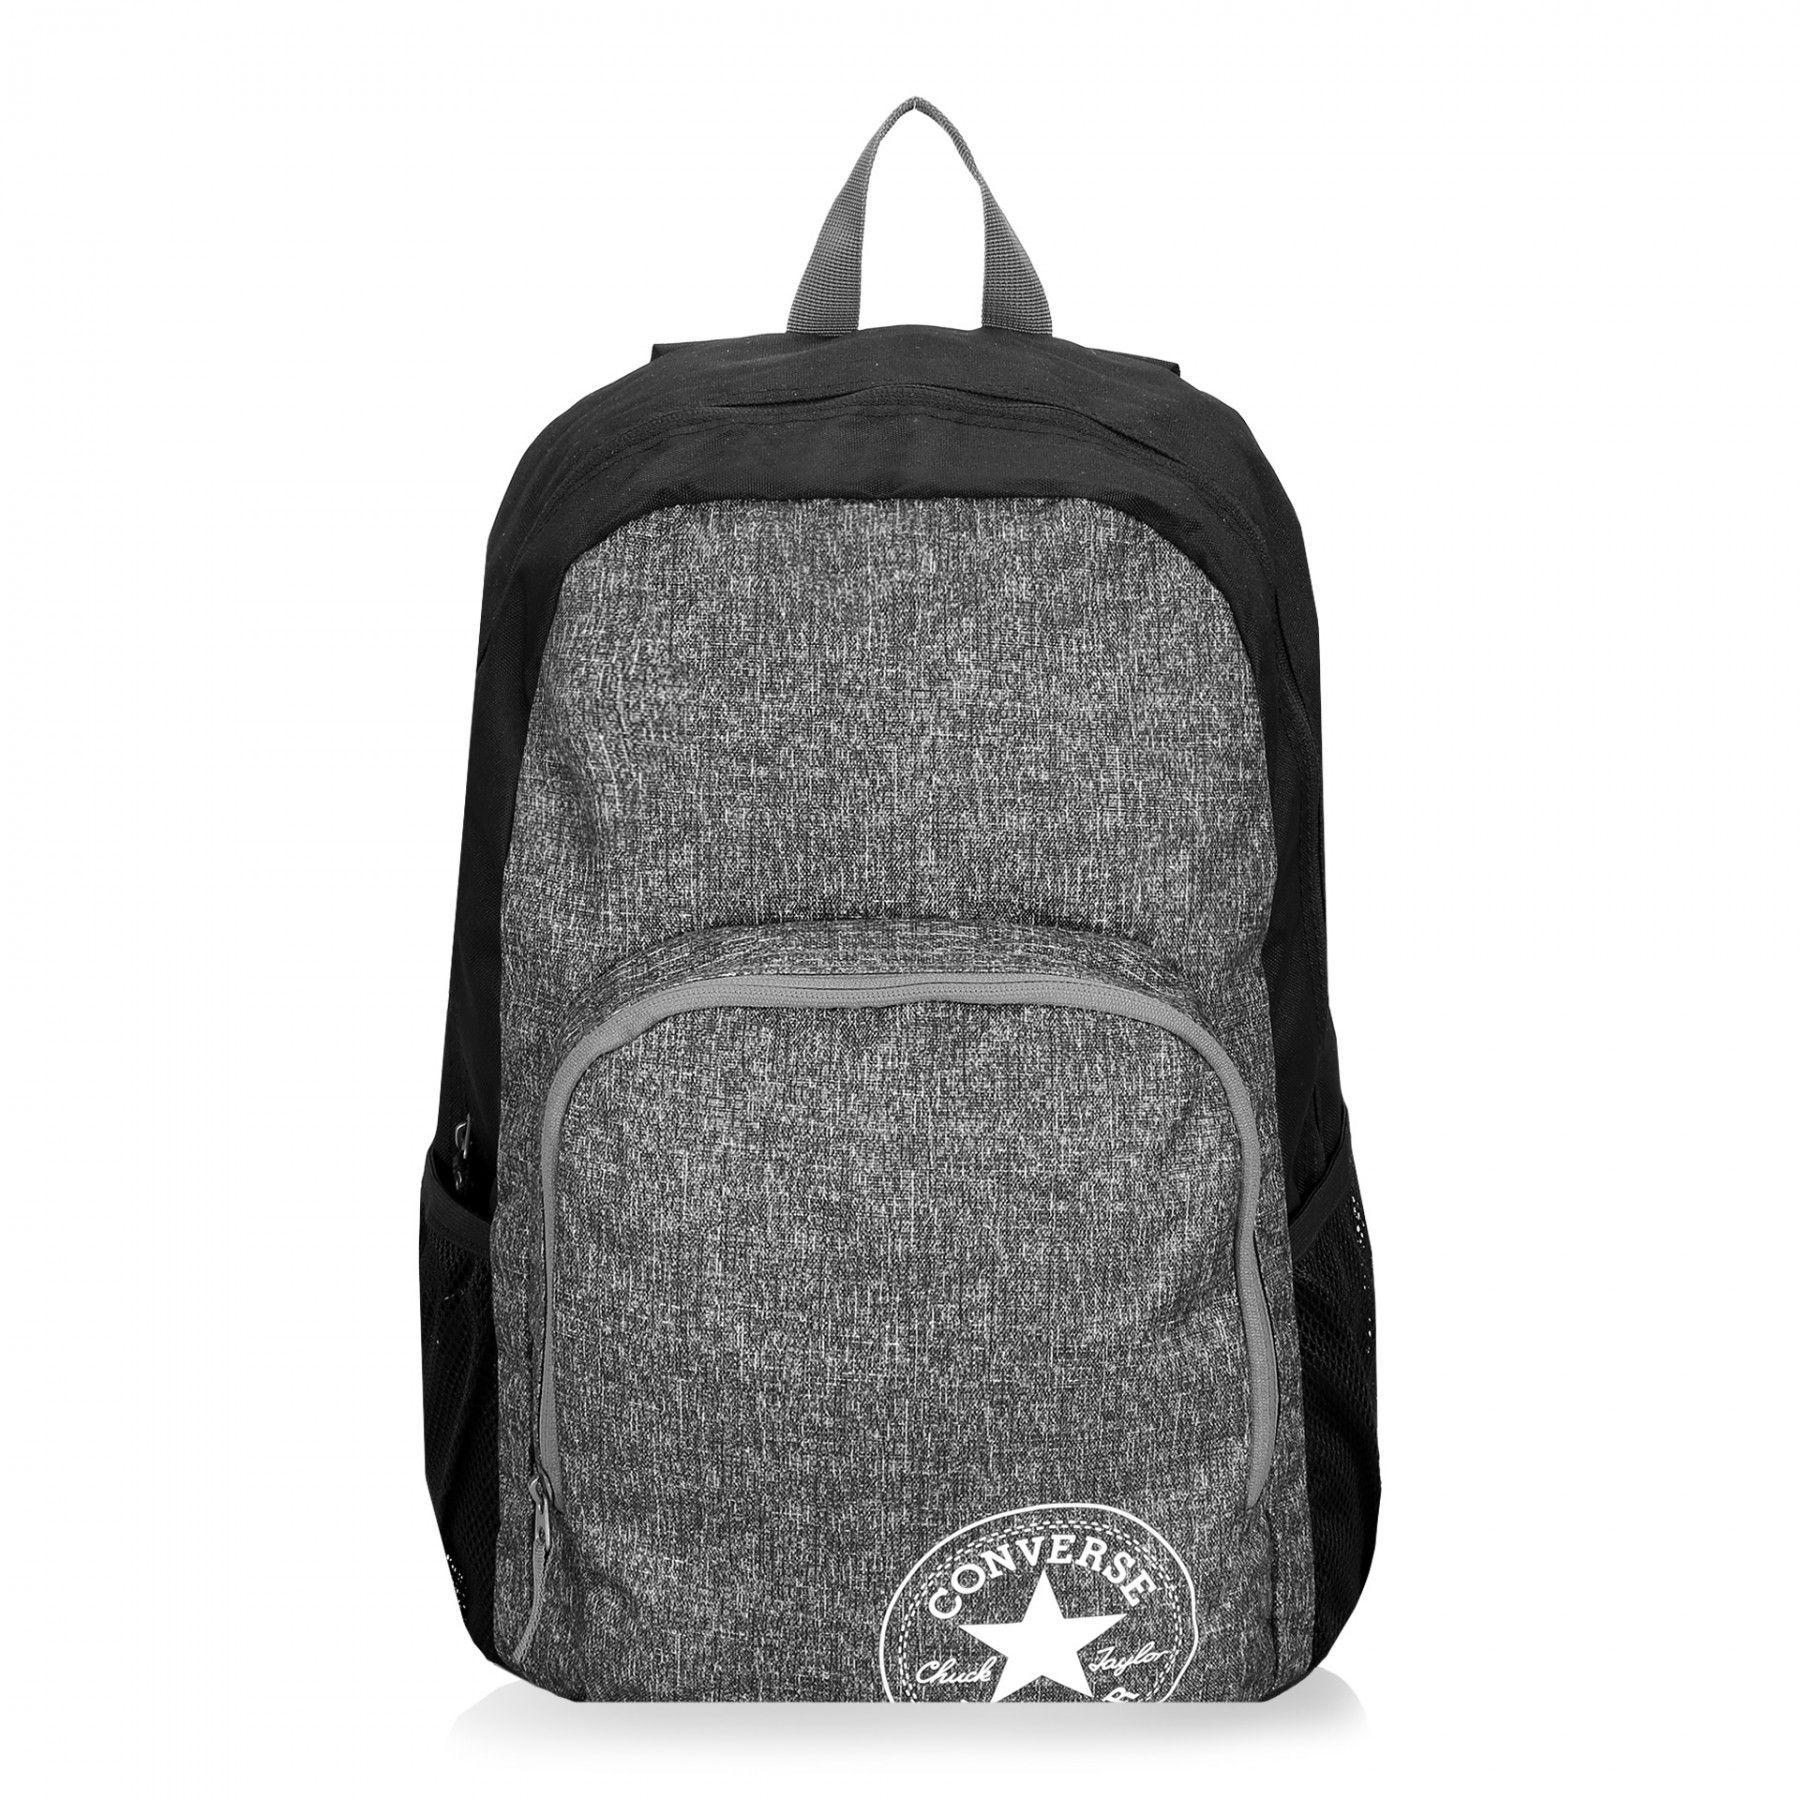 999dd30a0b95 Converse Classic Backpack